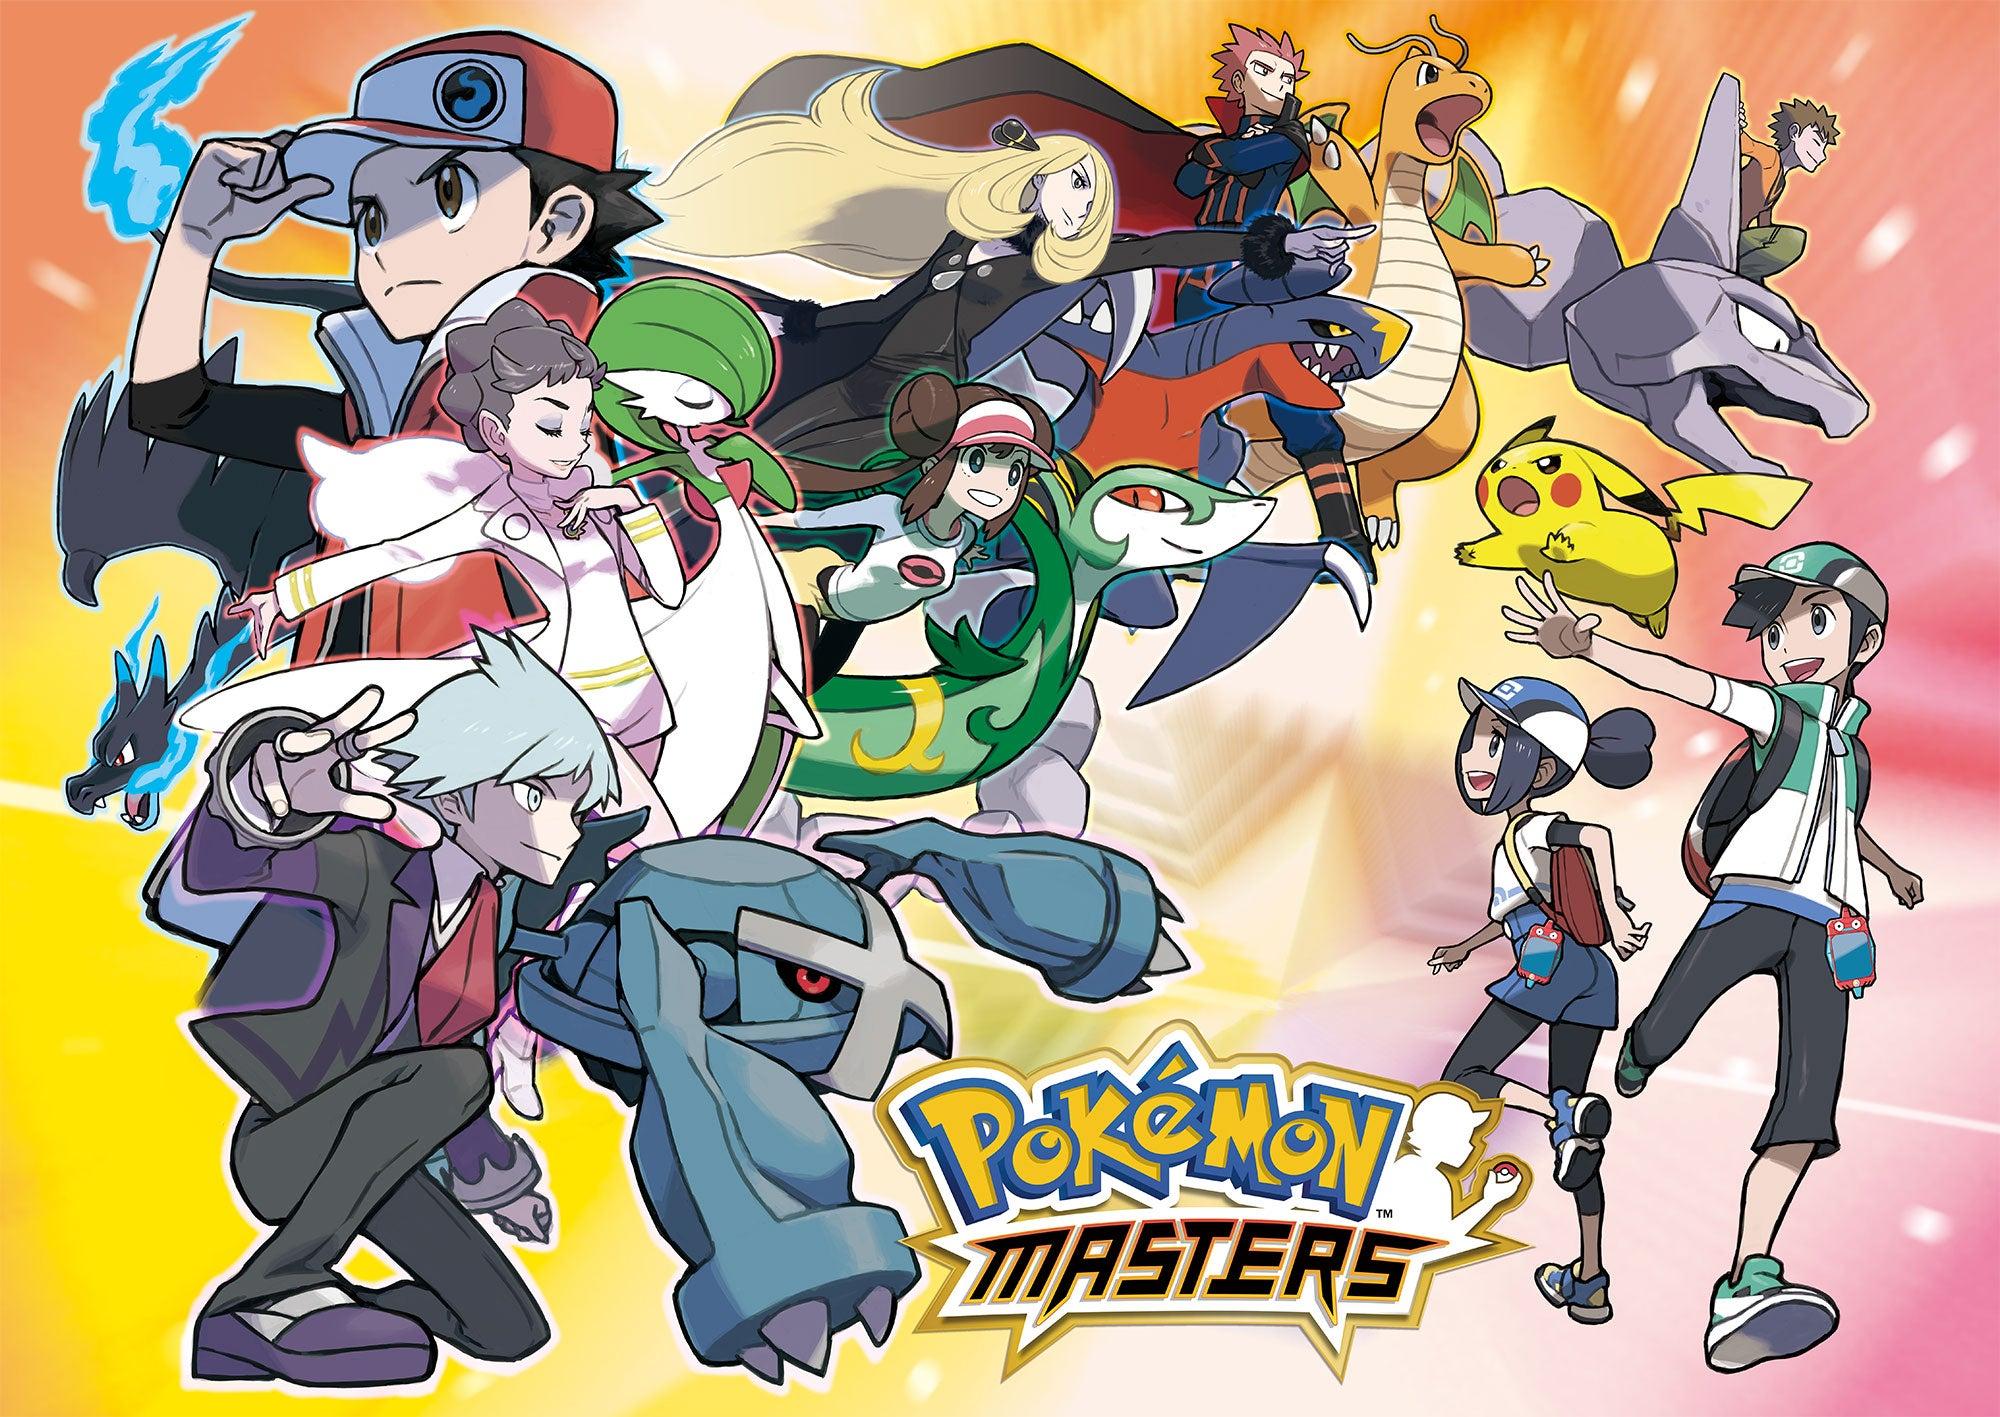 New Pokemon Games, Hardware & Services Announced